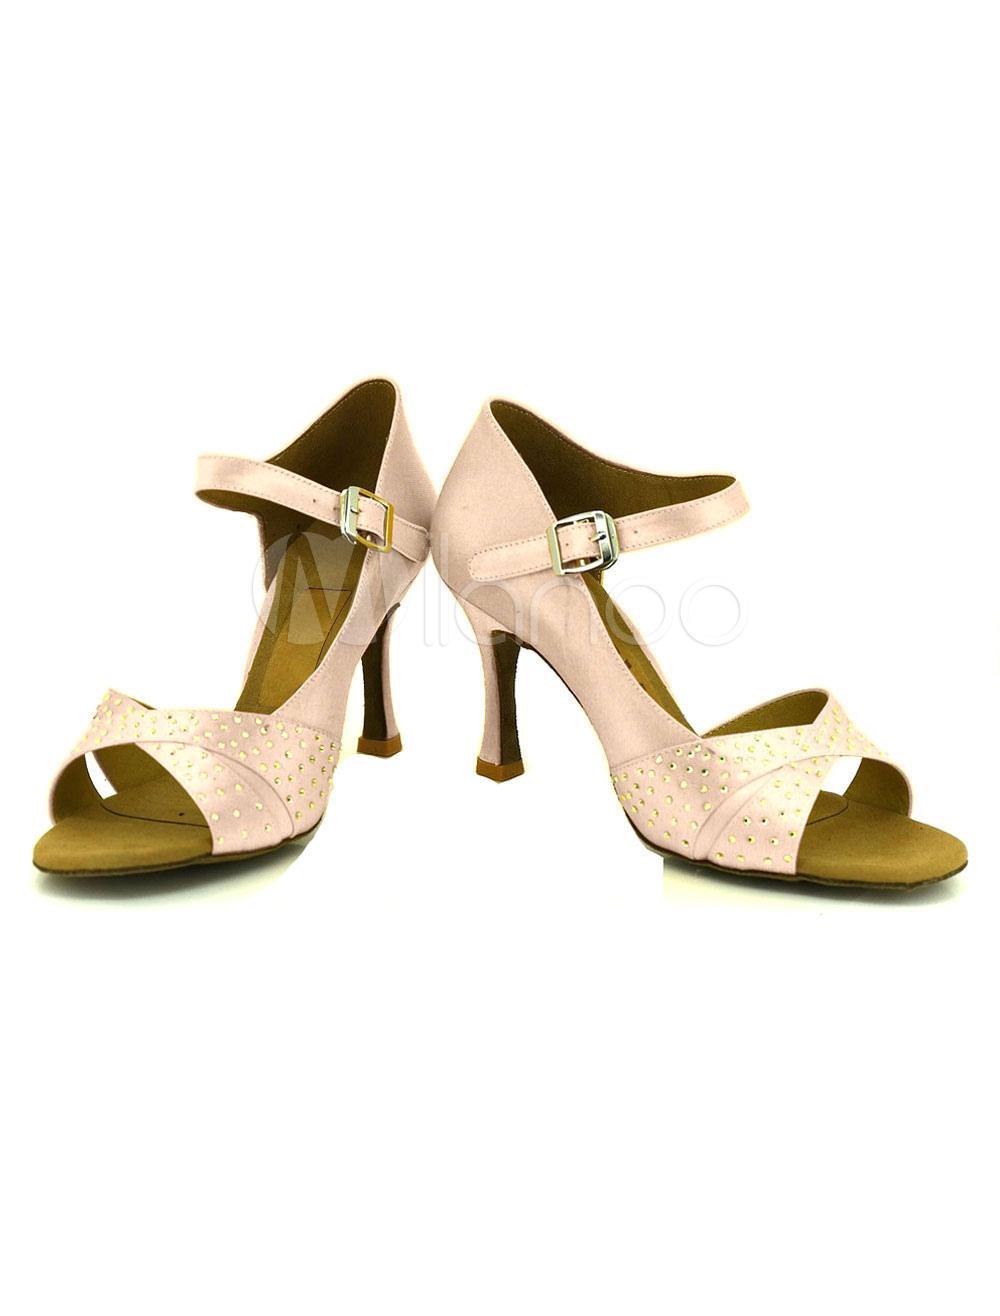 Zapatos de bailes latinos de satén de color albaricoque color liso ztZ6wCL1